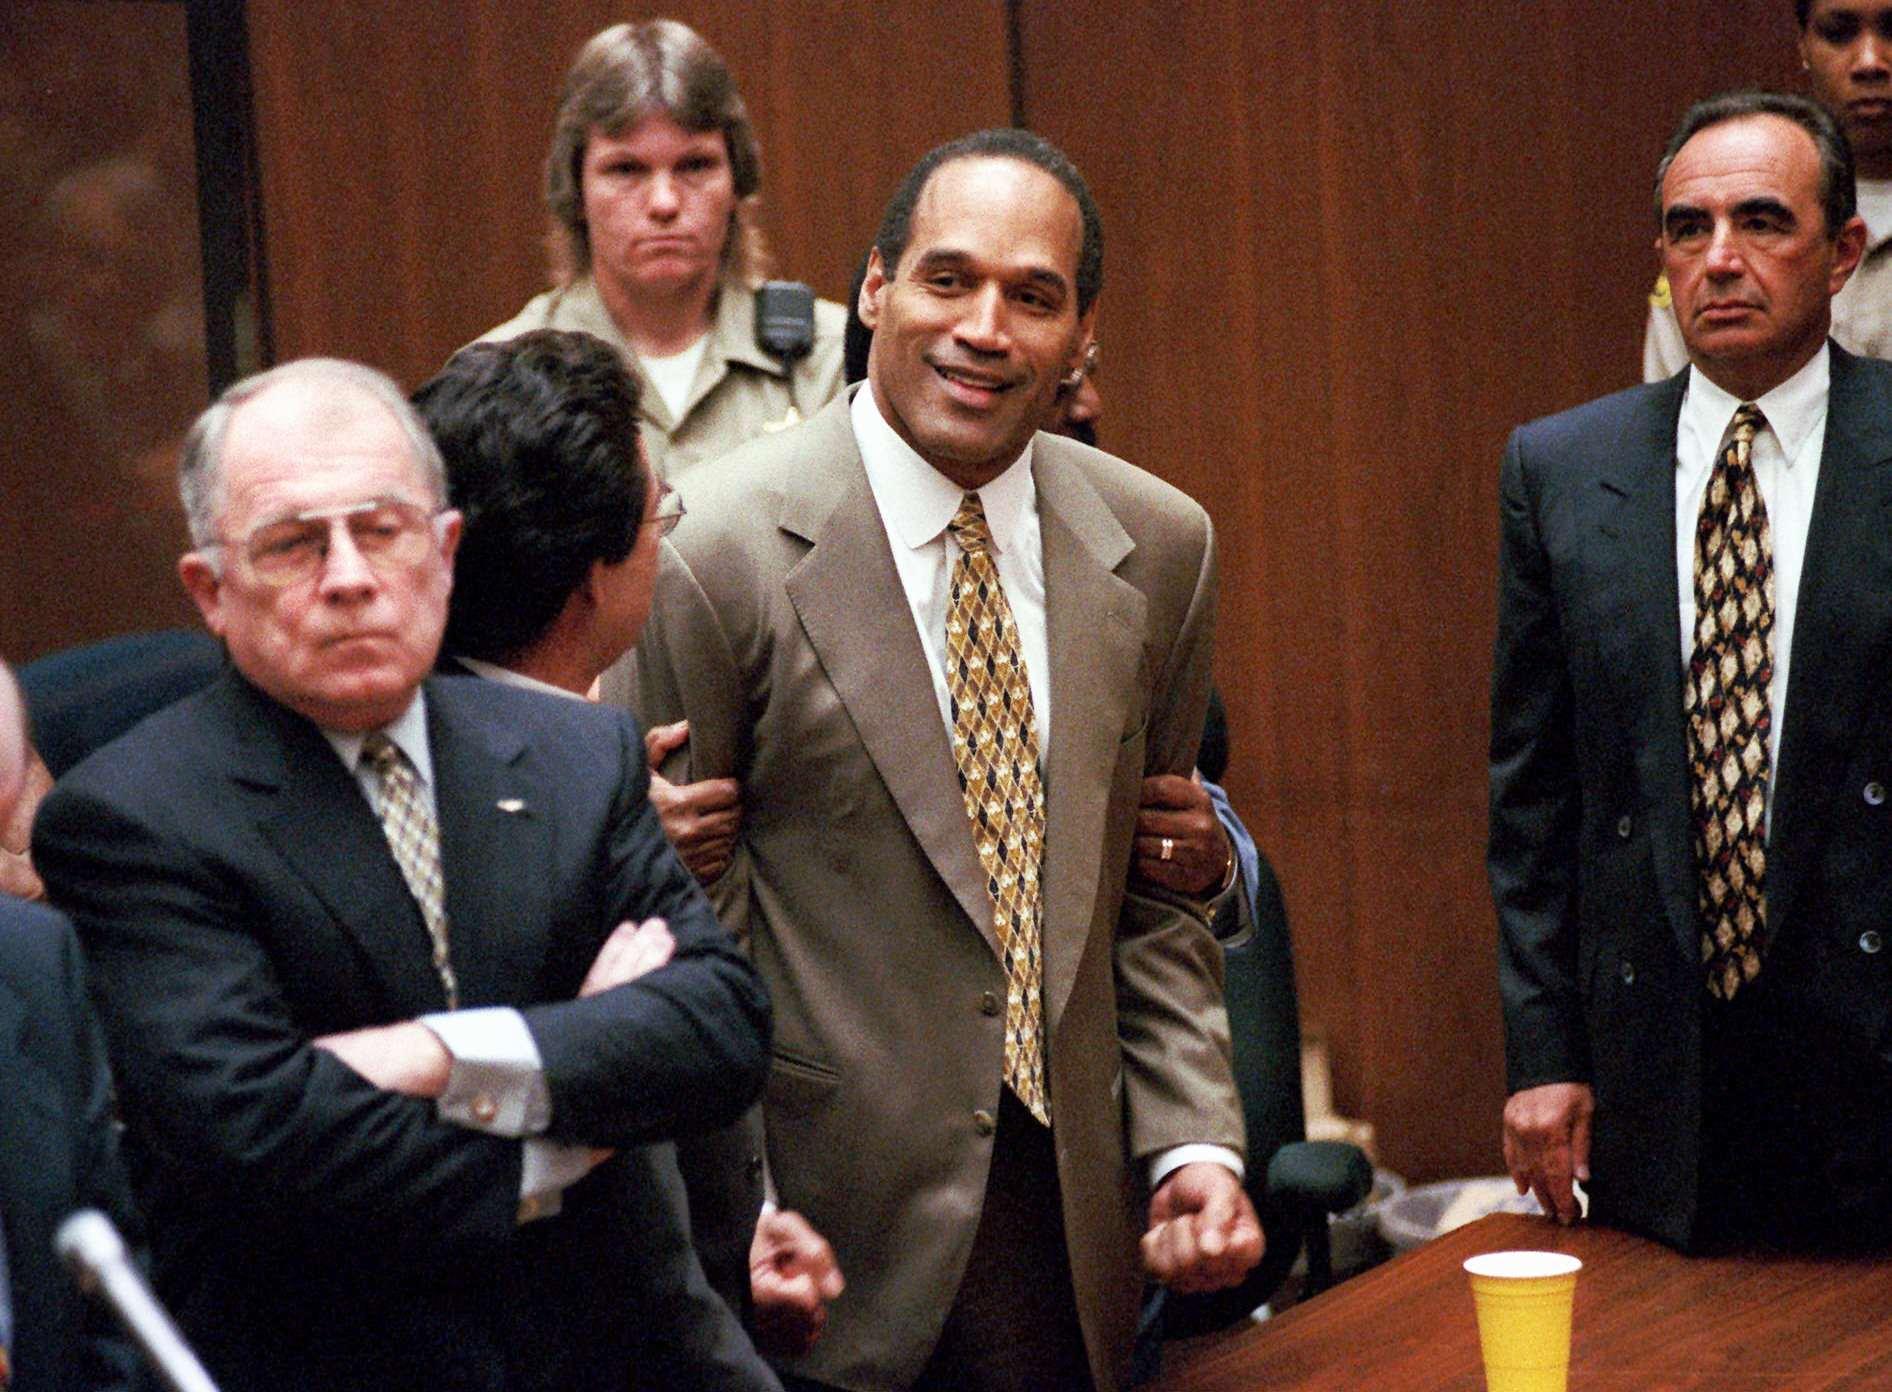 OJ Simpson Acquittal